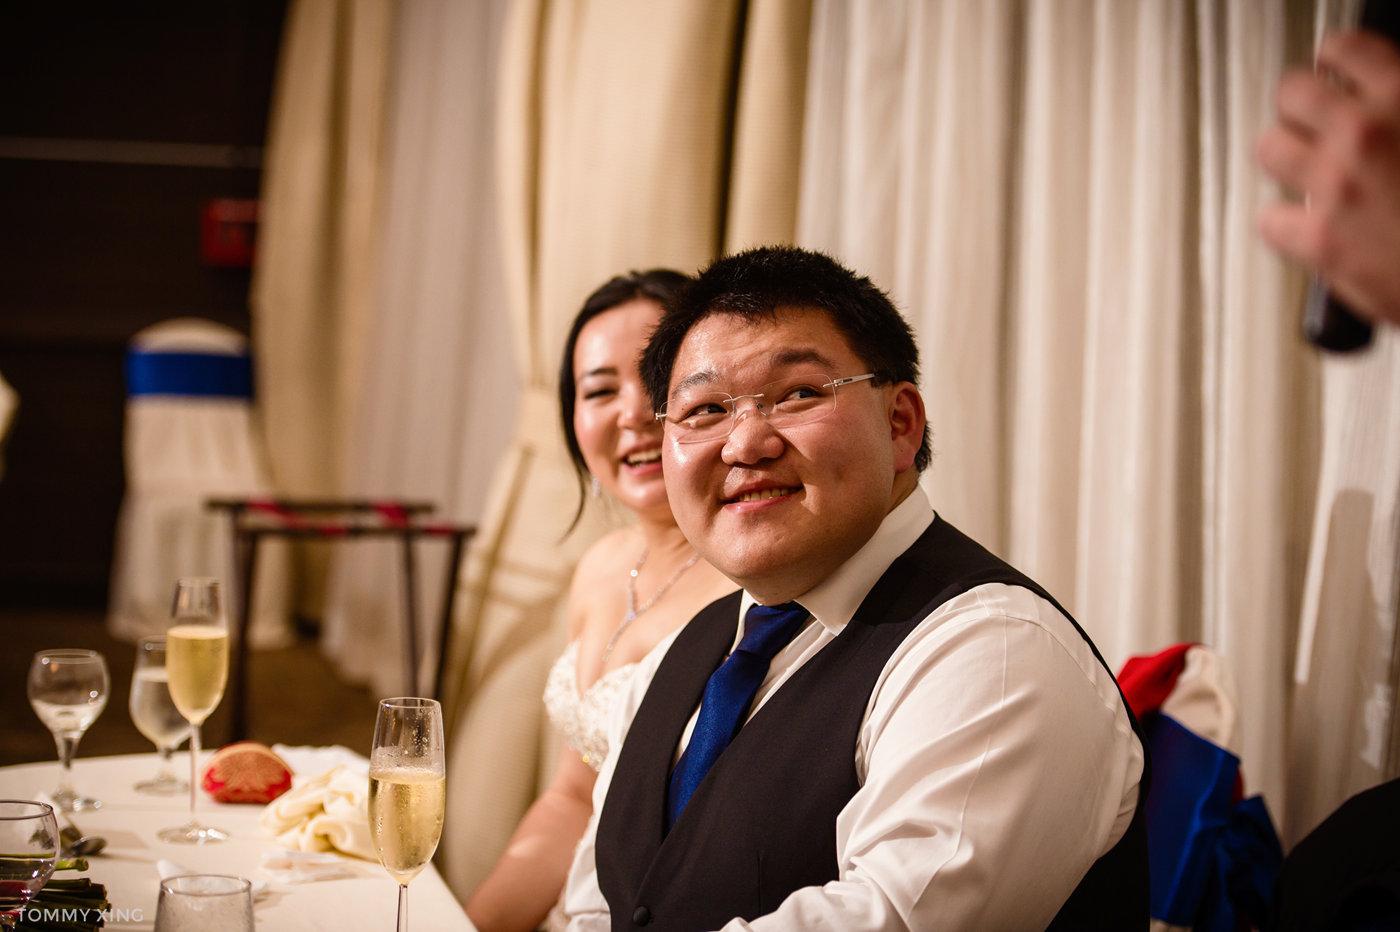 STANFORD MEMORIAL CHURCH WEDDING - Wenjie & Chengcheng - SAN FRANCISCO BAY AREA 斯坦福教堂婚礼跟拍 - 洛杉矶婚礼婚纱照摄影师 Tommy Xing Photography203.jpg